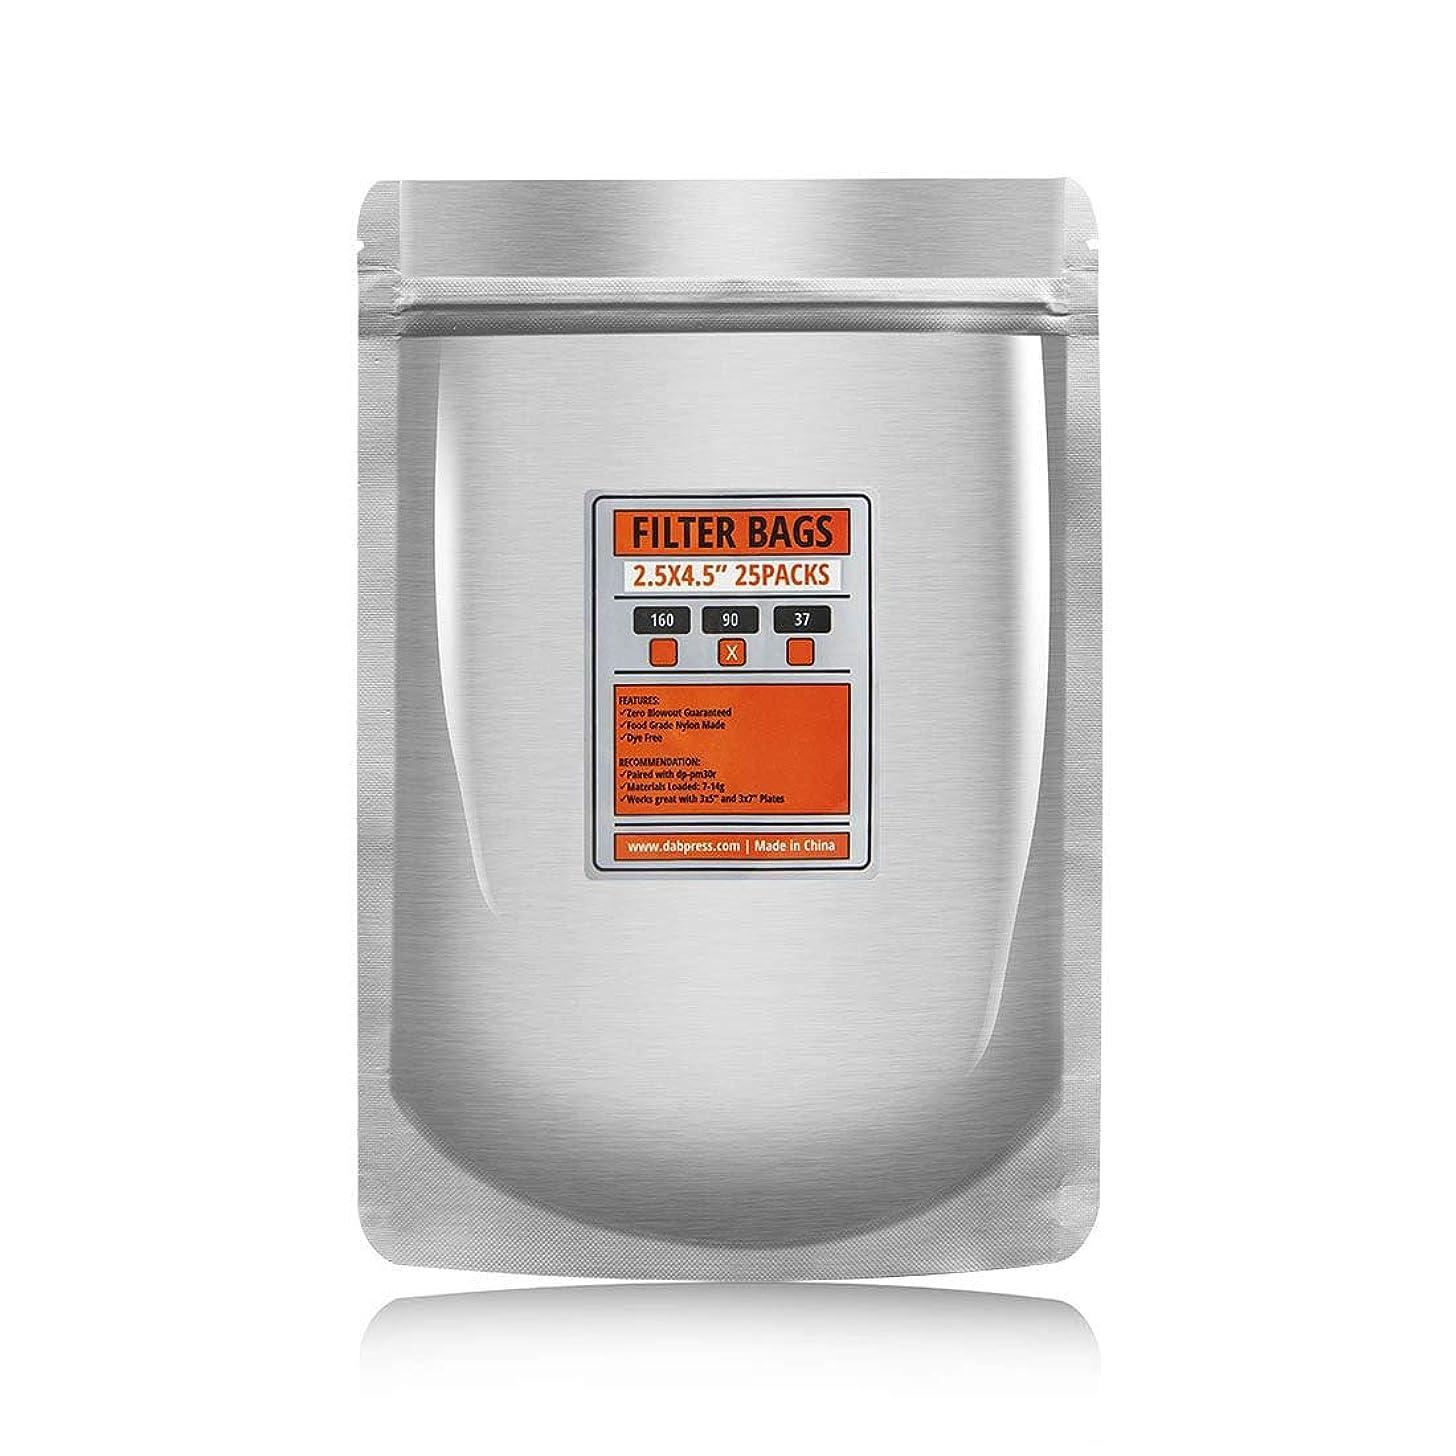 iBudtek 2.5x4.5 Inch | 90 Micron Heat Press Bags | Nylon Tea Filter Press Screen Bags | 25 Bags Per Package | Pair It with dp-pm40r PrePress Mold